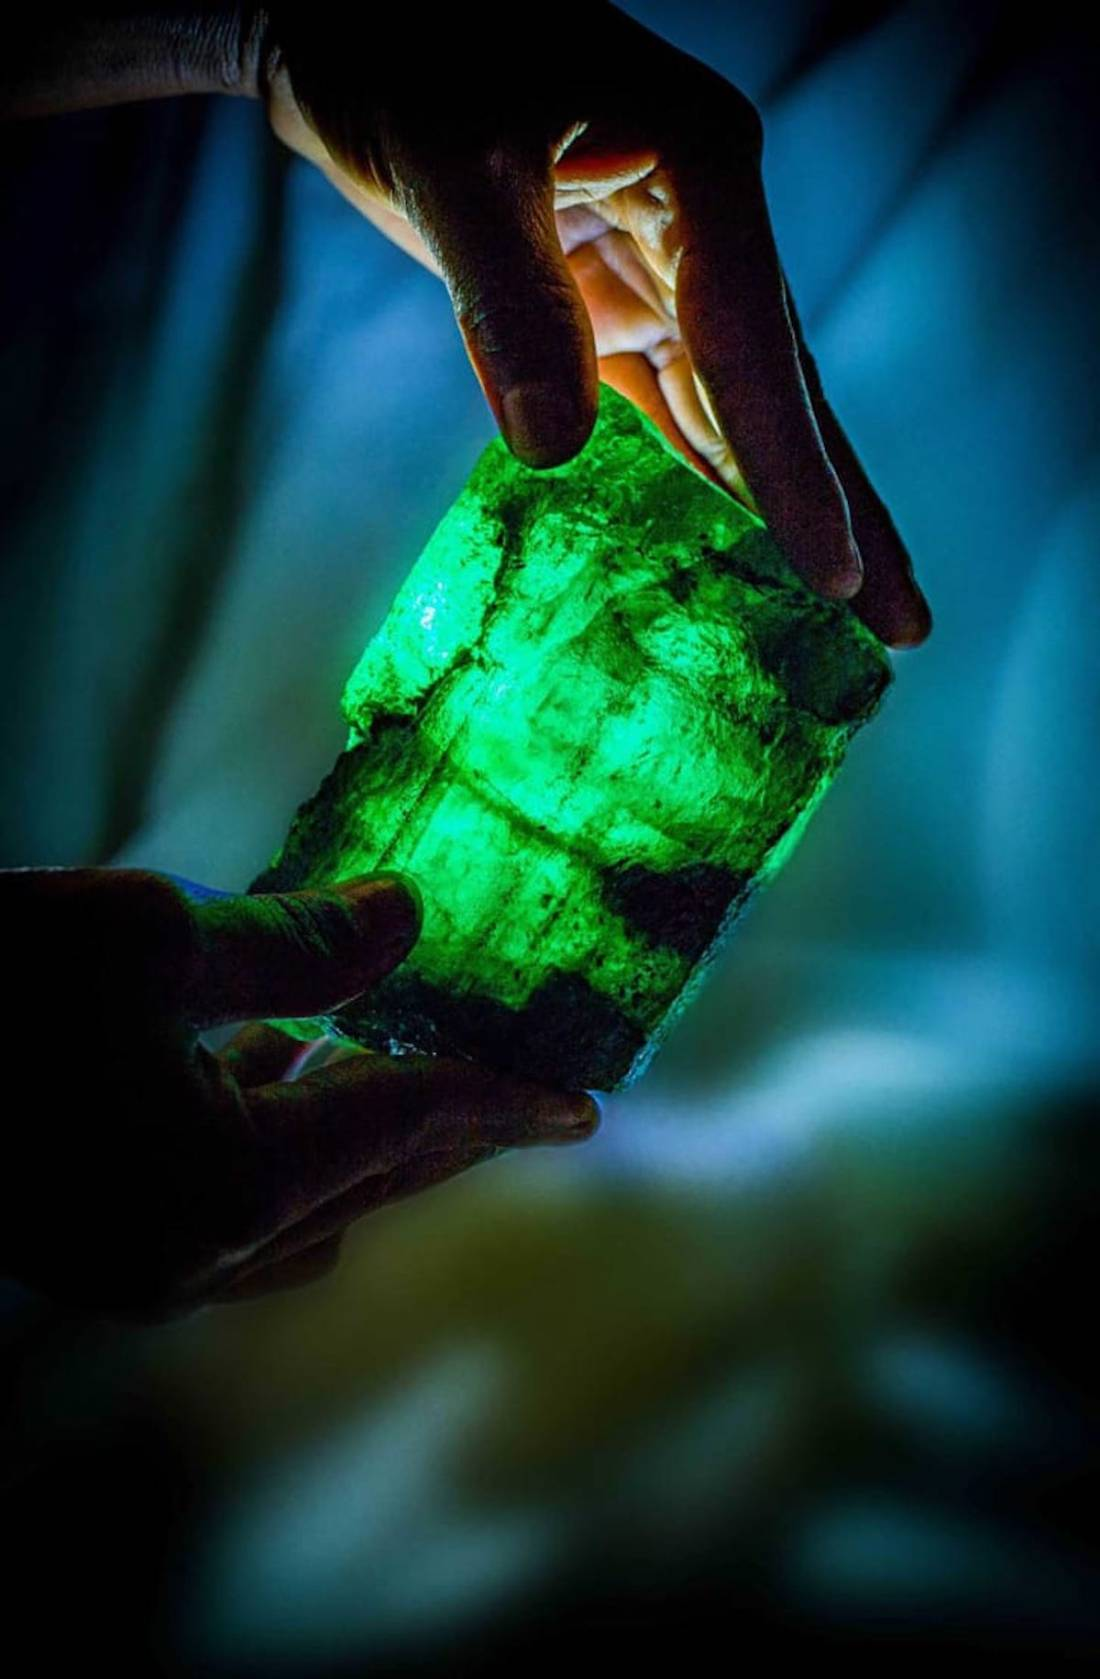 Zambia, Zambia Emerald, Giant Emerald, KOLUMN Magazine, KOLUMN, KINDR'D Magazine, KINDR'D, Willoughby Avenue, African American News